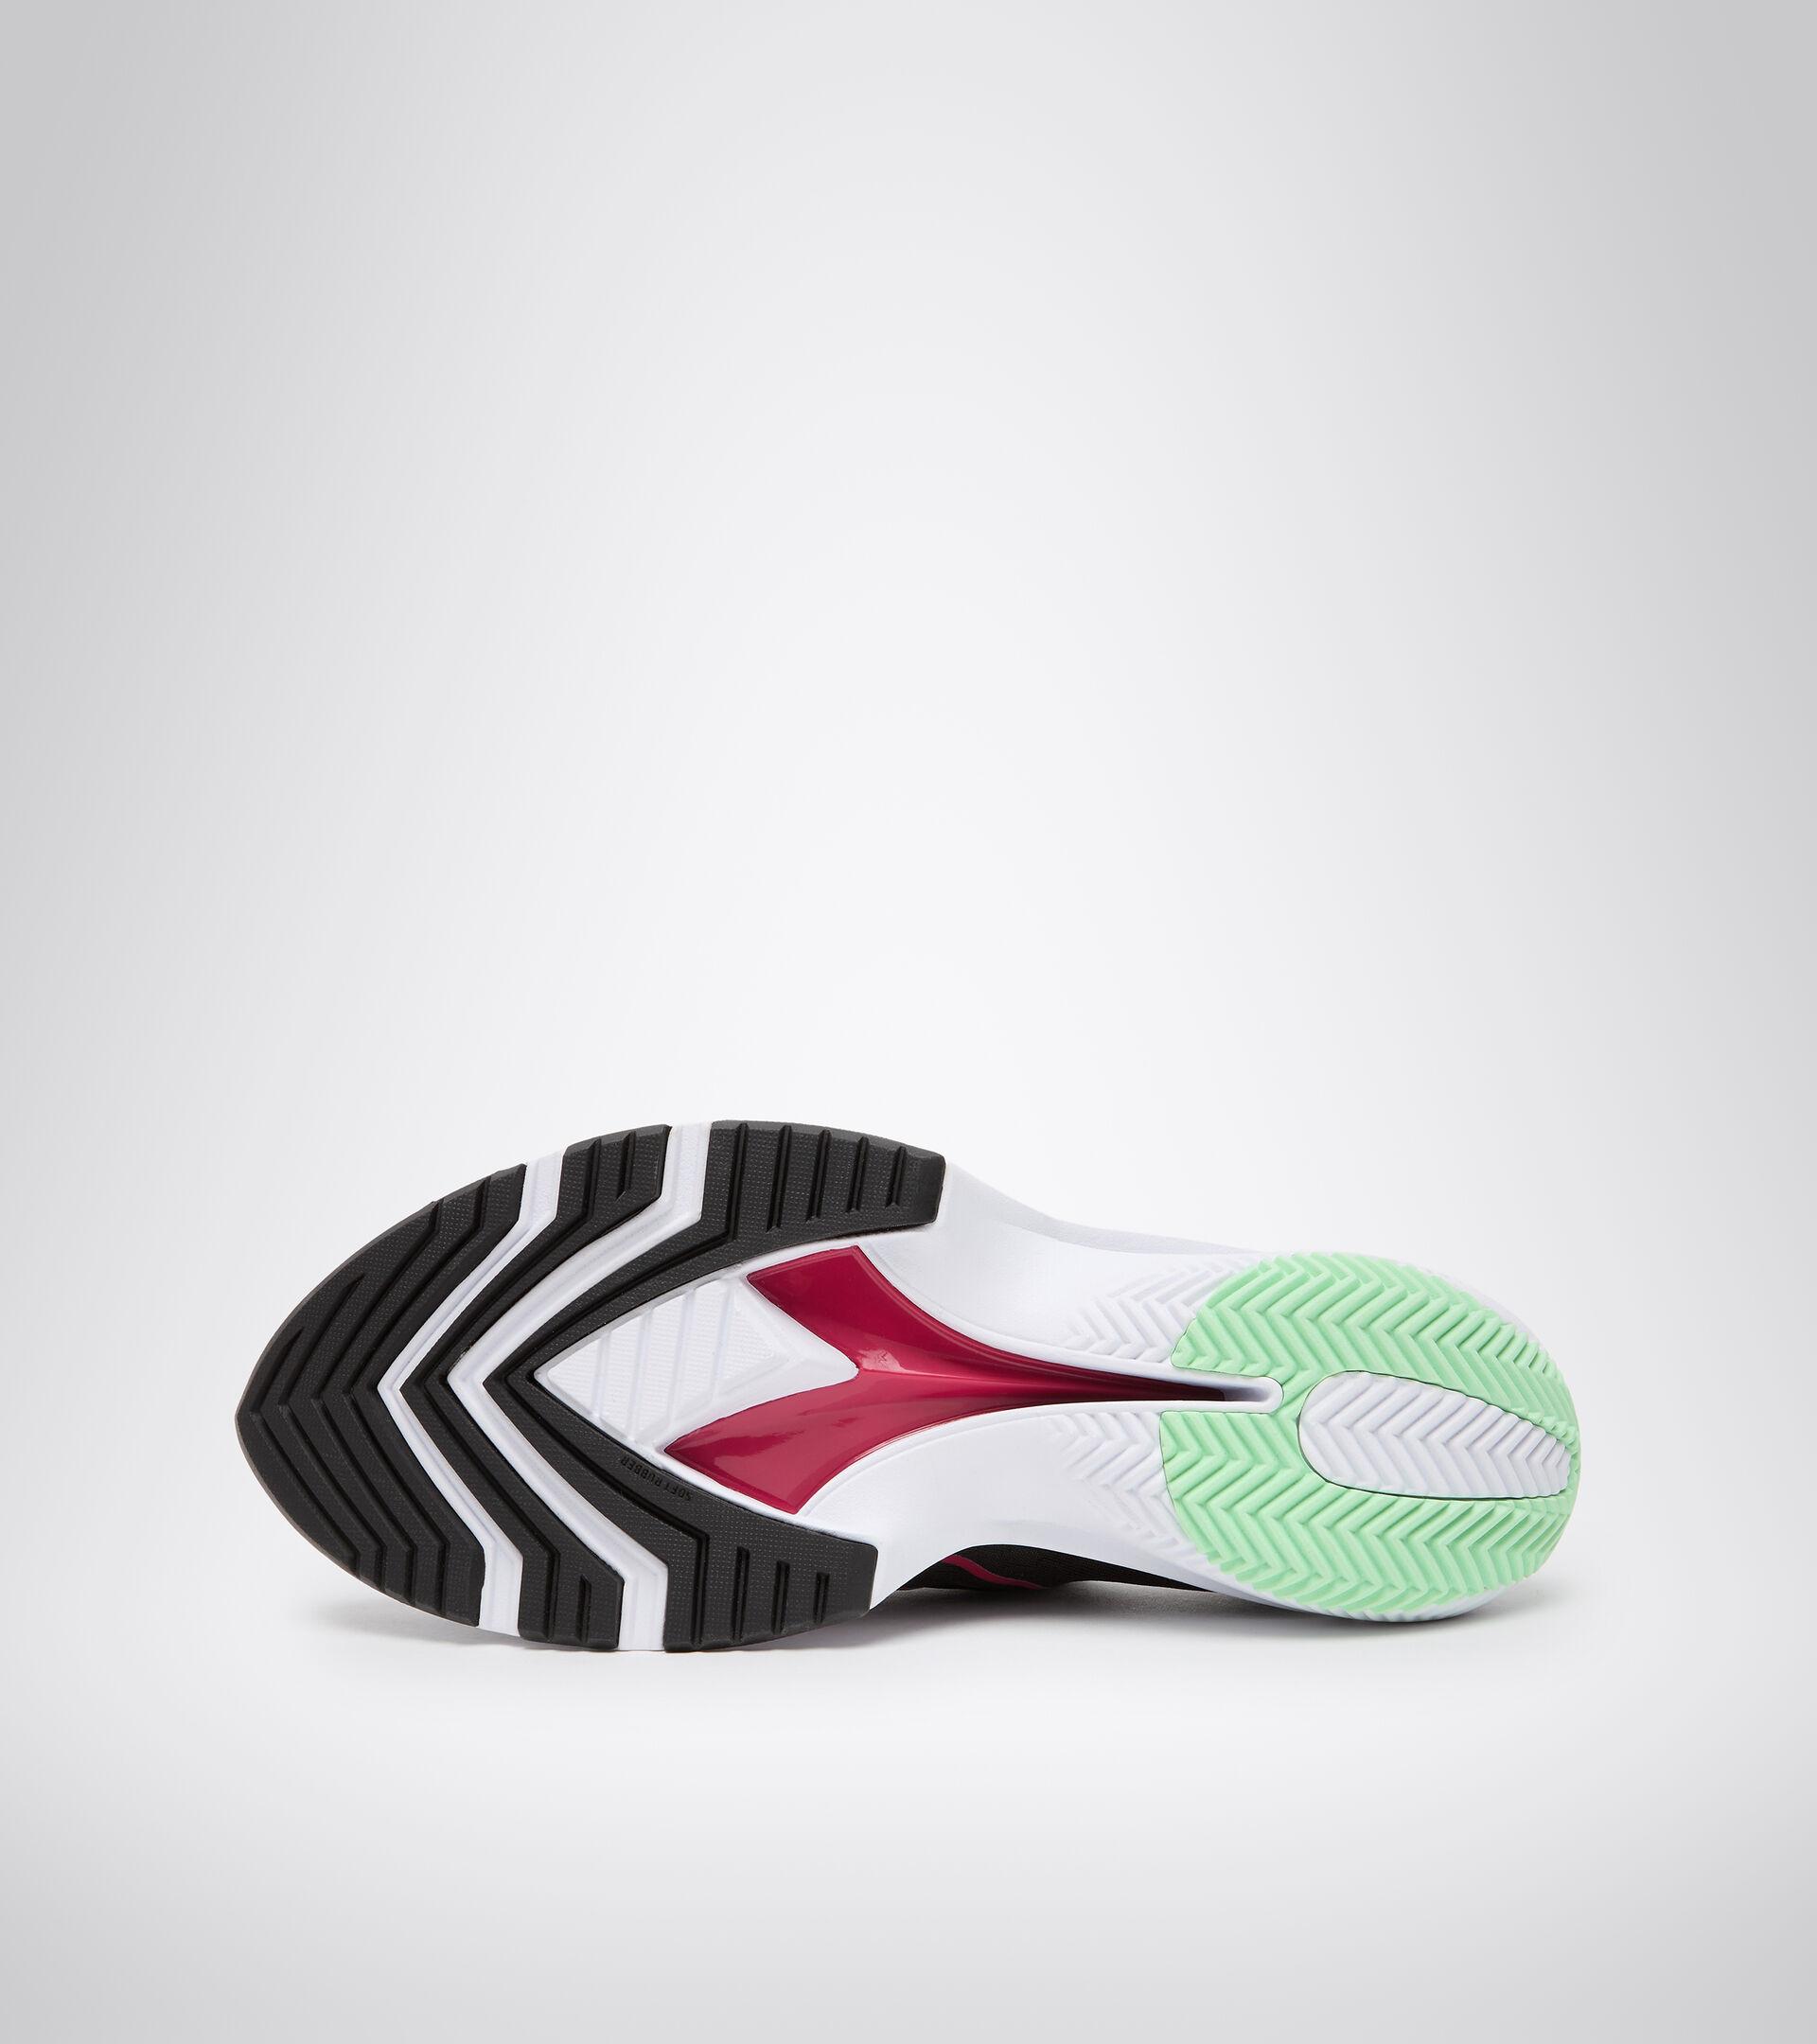 Chaussures de running - Femme EQUIPE CORSA W NOIR/ROSE VOYANT/BLANC - Diadora